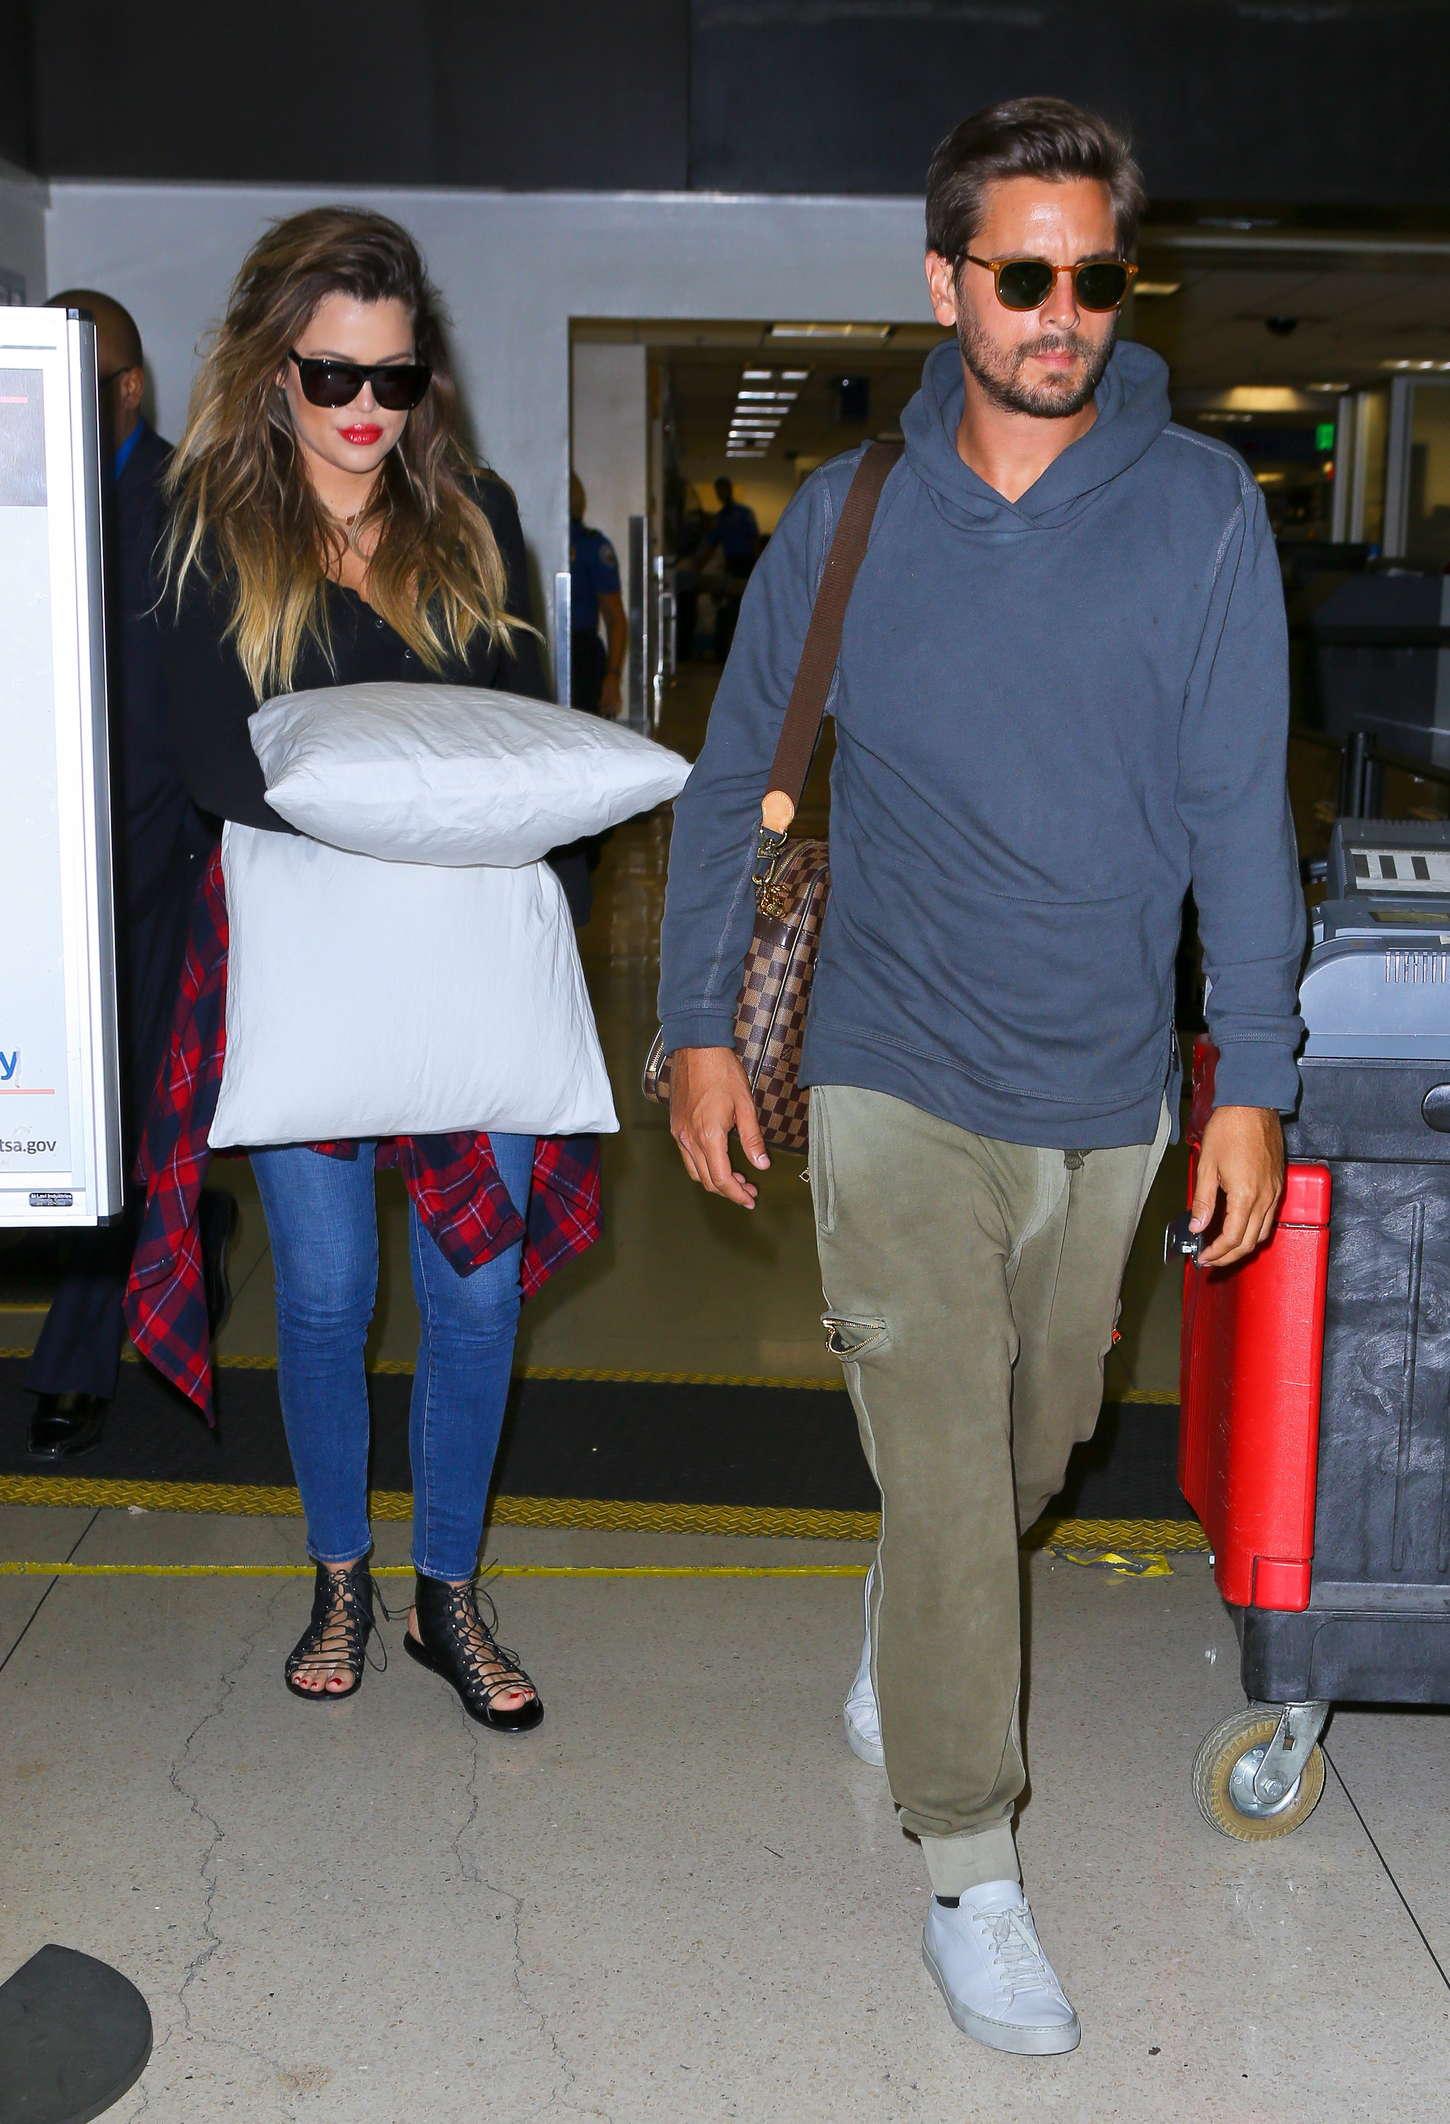 Khloe Kardashian 2014 : Khloe Kardashian with Scott Disick at LAX airport -02